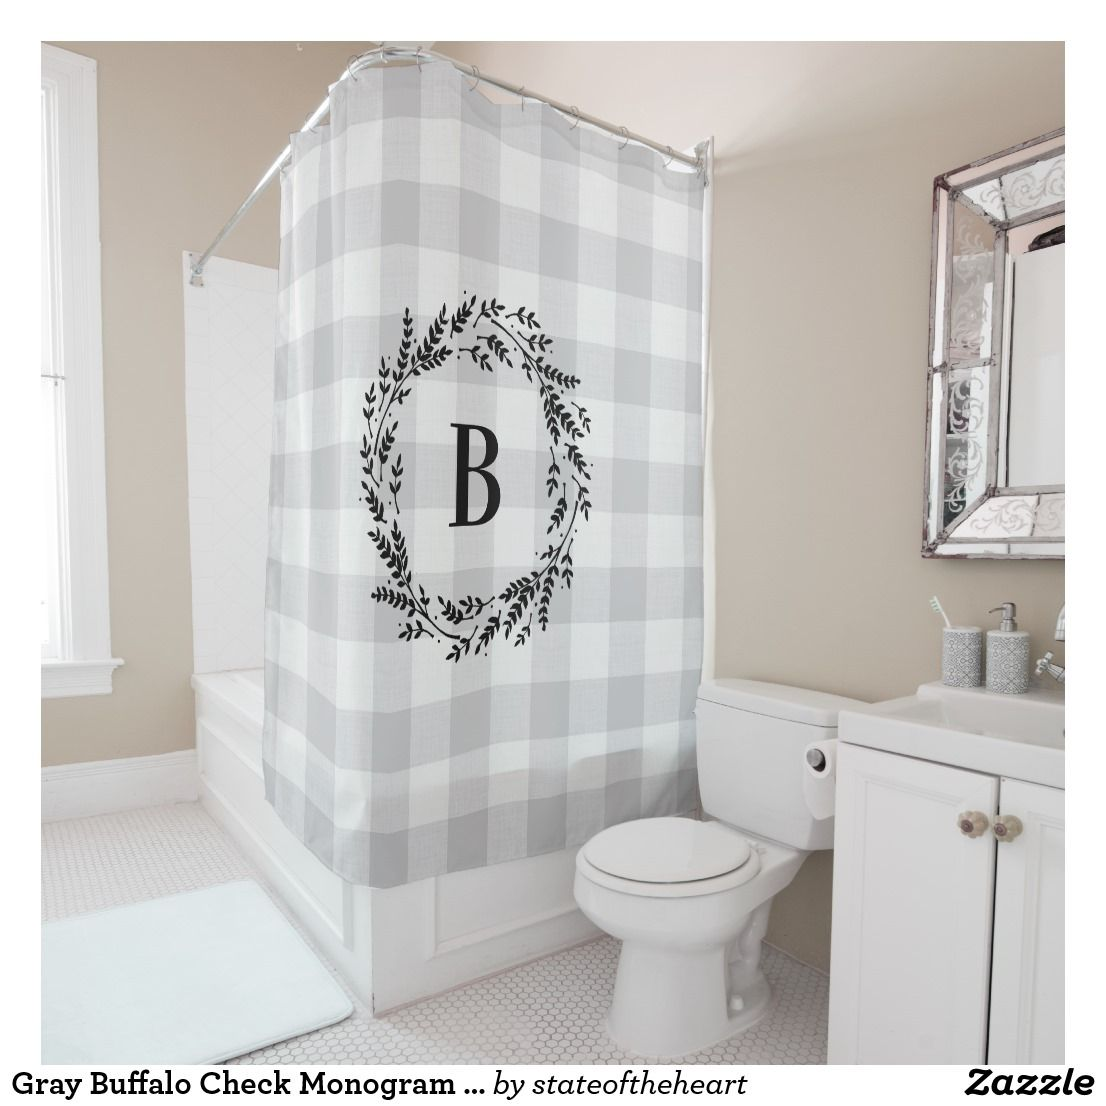 Gray Buffalo Check Monogram Farmhouse Bathroom Shower Curtain